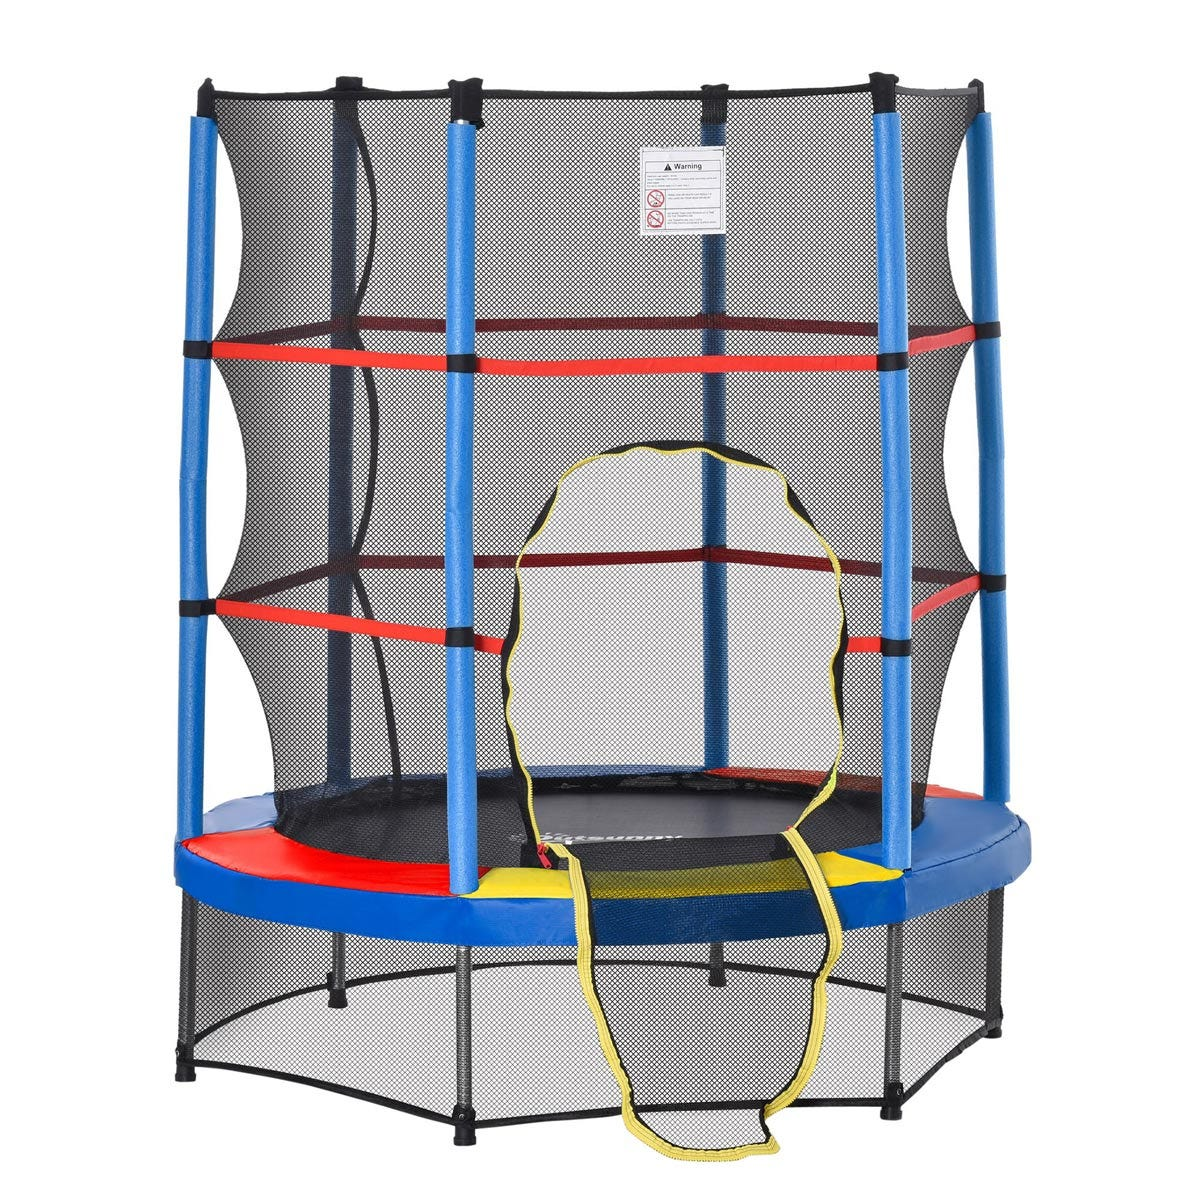 Jouet Kids 140cm Trampoline with Enclosure Net - Blue/Red/Black